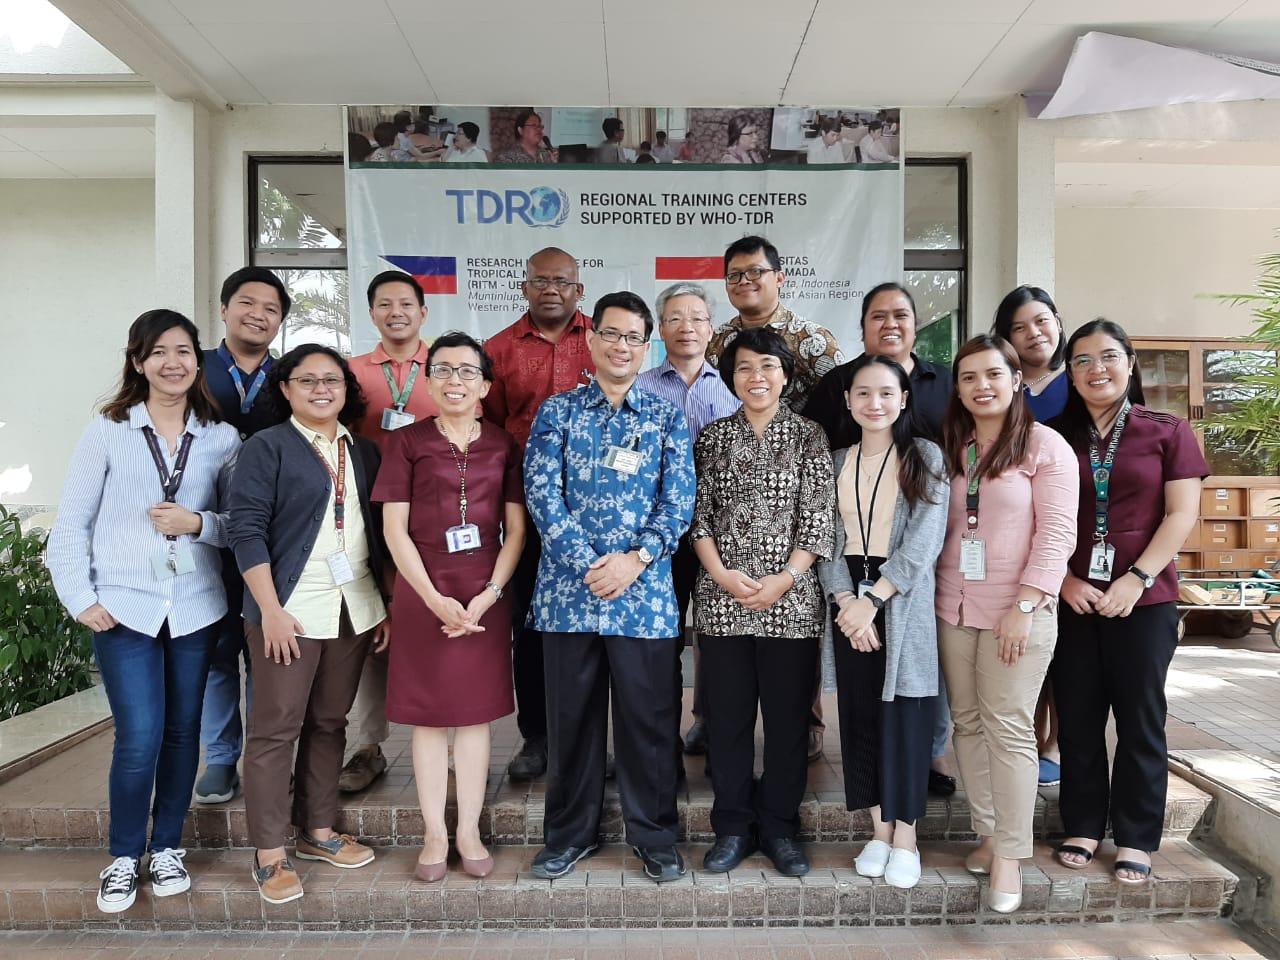 Dosen S3 IKM UNS atas nama Ari Natalia Probandari, dr, MPH, PhD menjadi Fasilitator Implementation Research Training di Research Institute of Tropical Medicine the Philippines